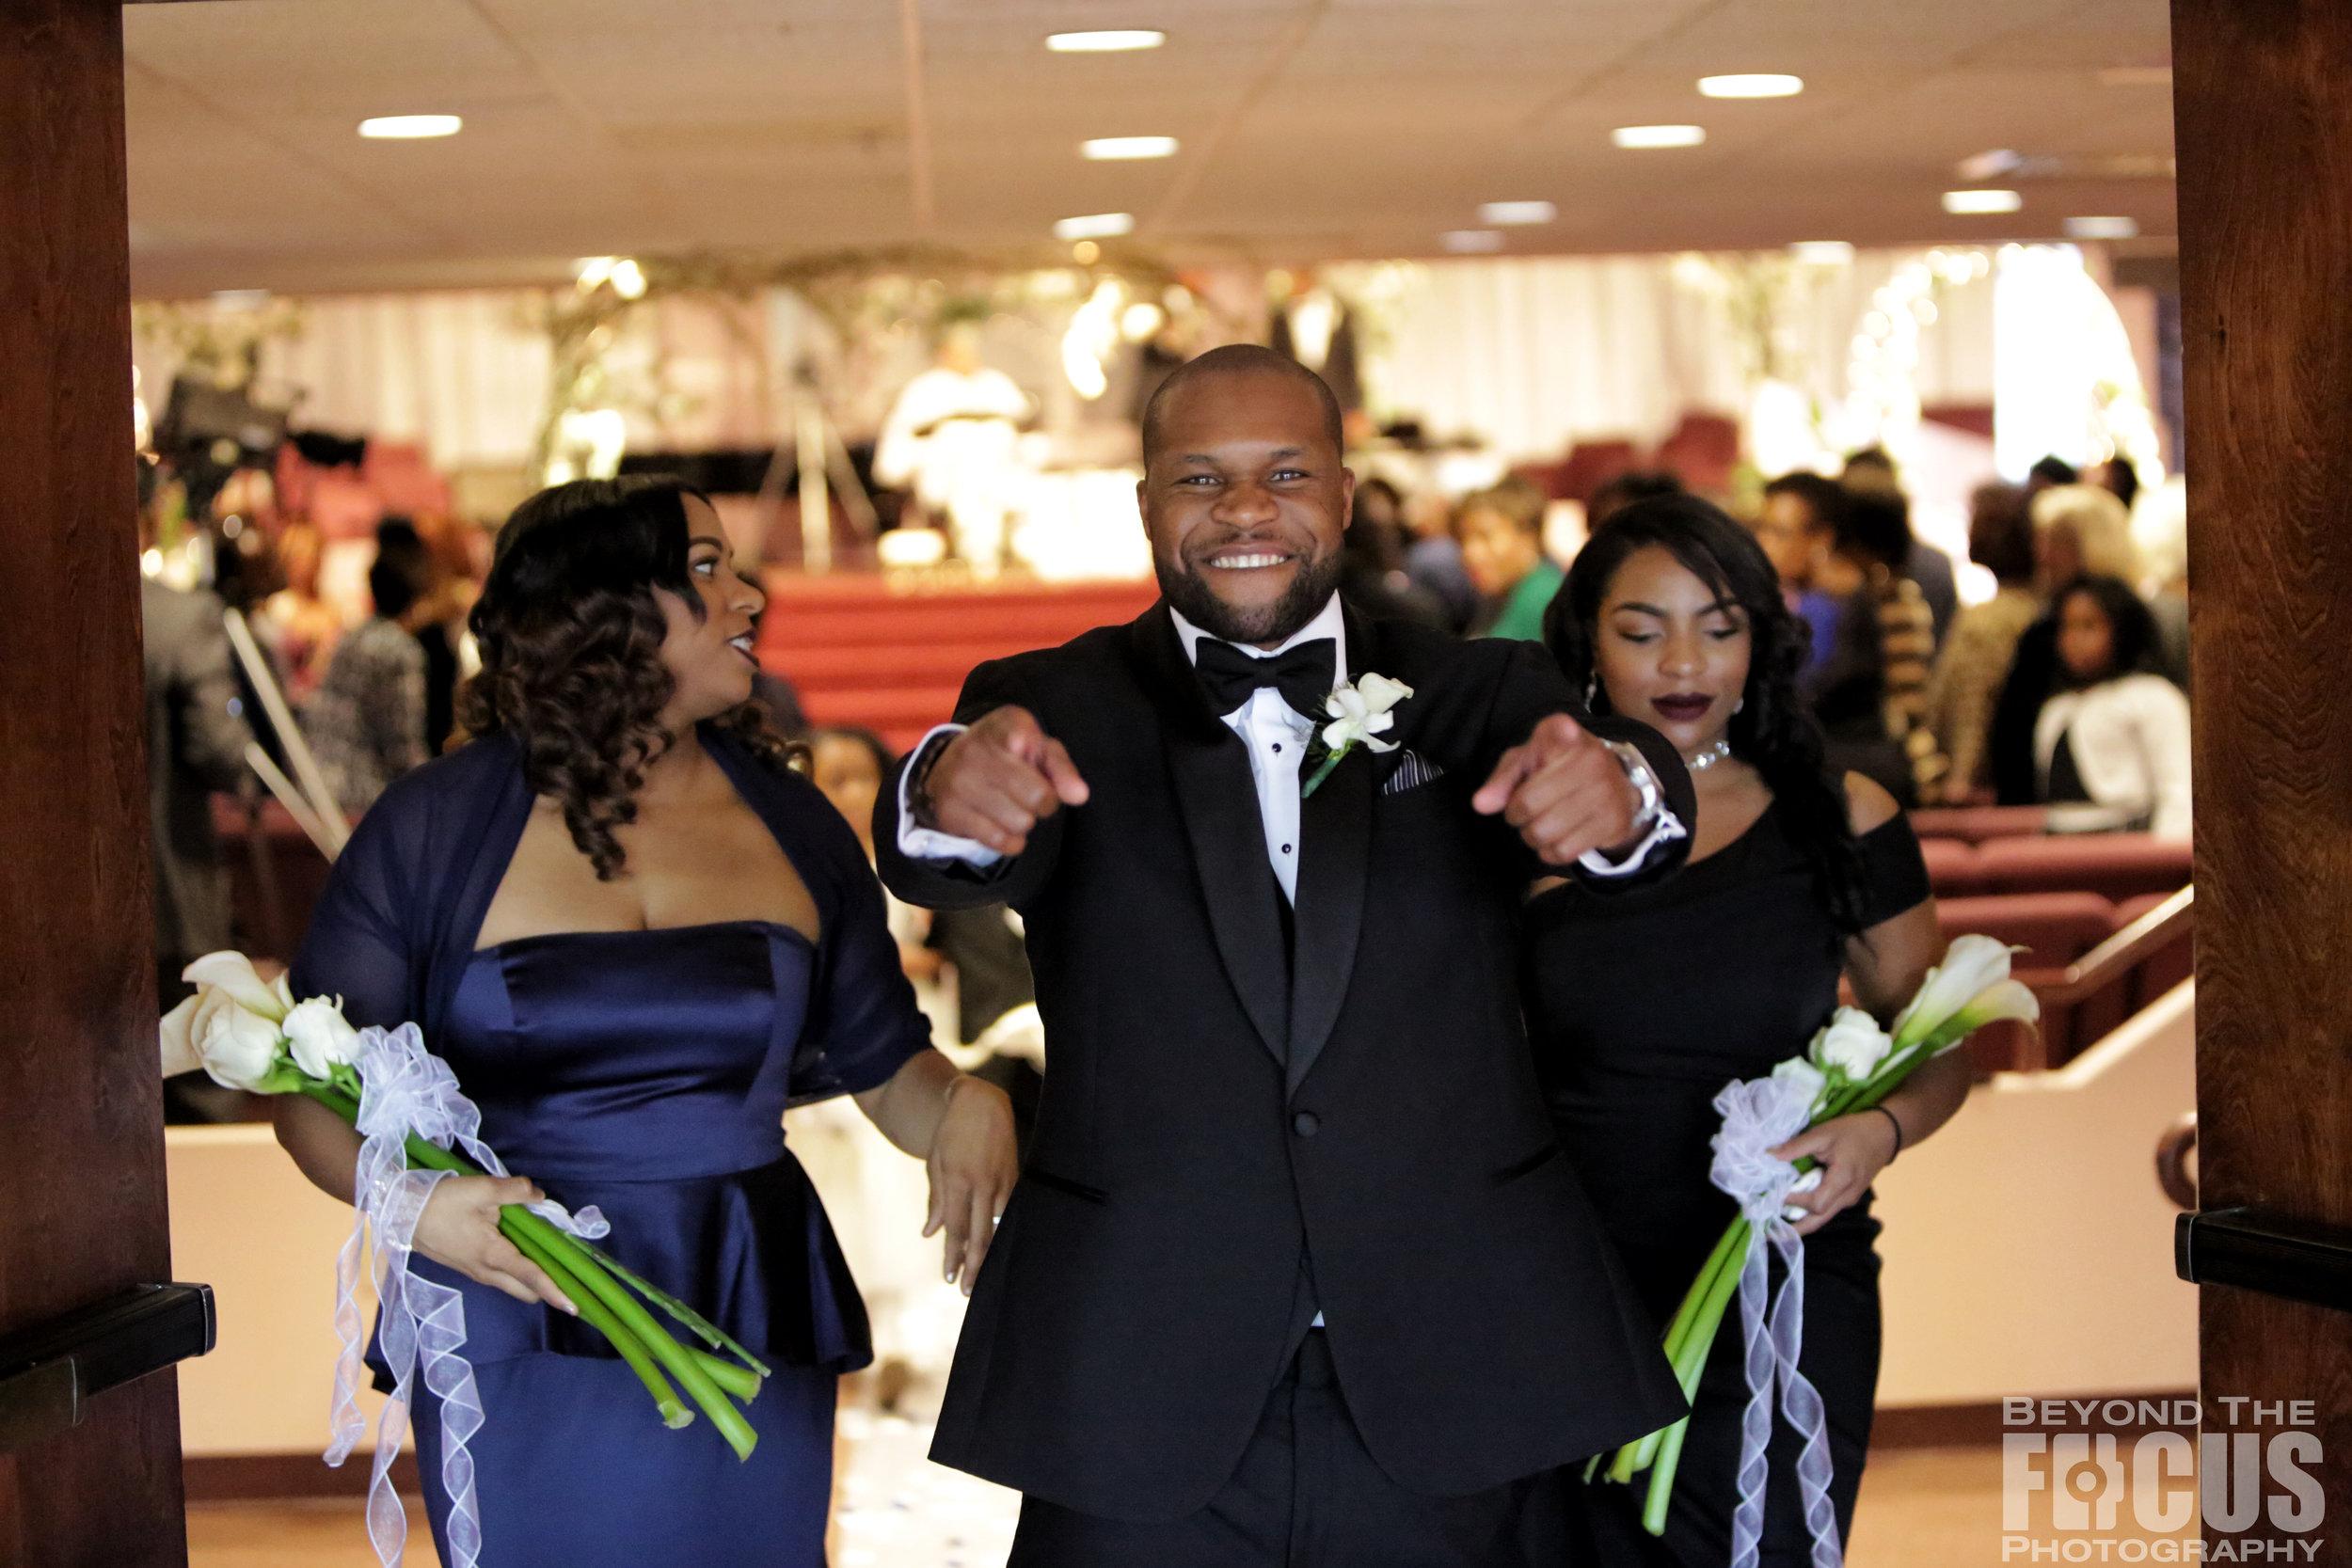 Matthews_Wedding_Ceremony_105.jpg